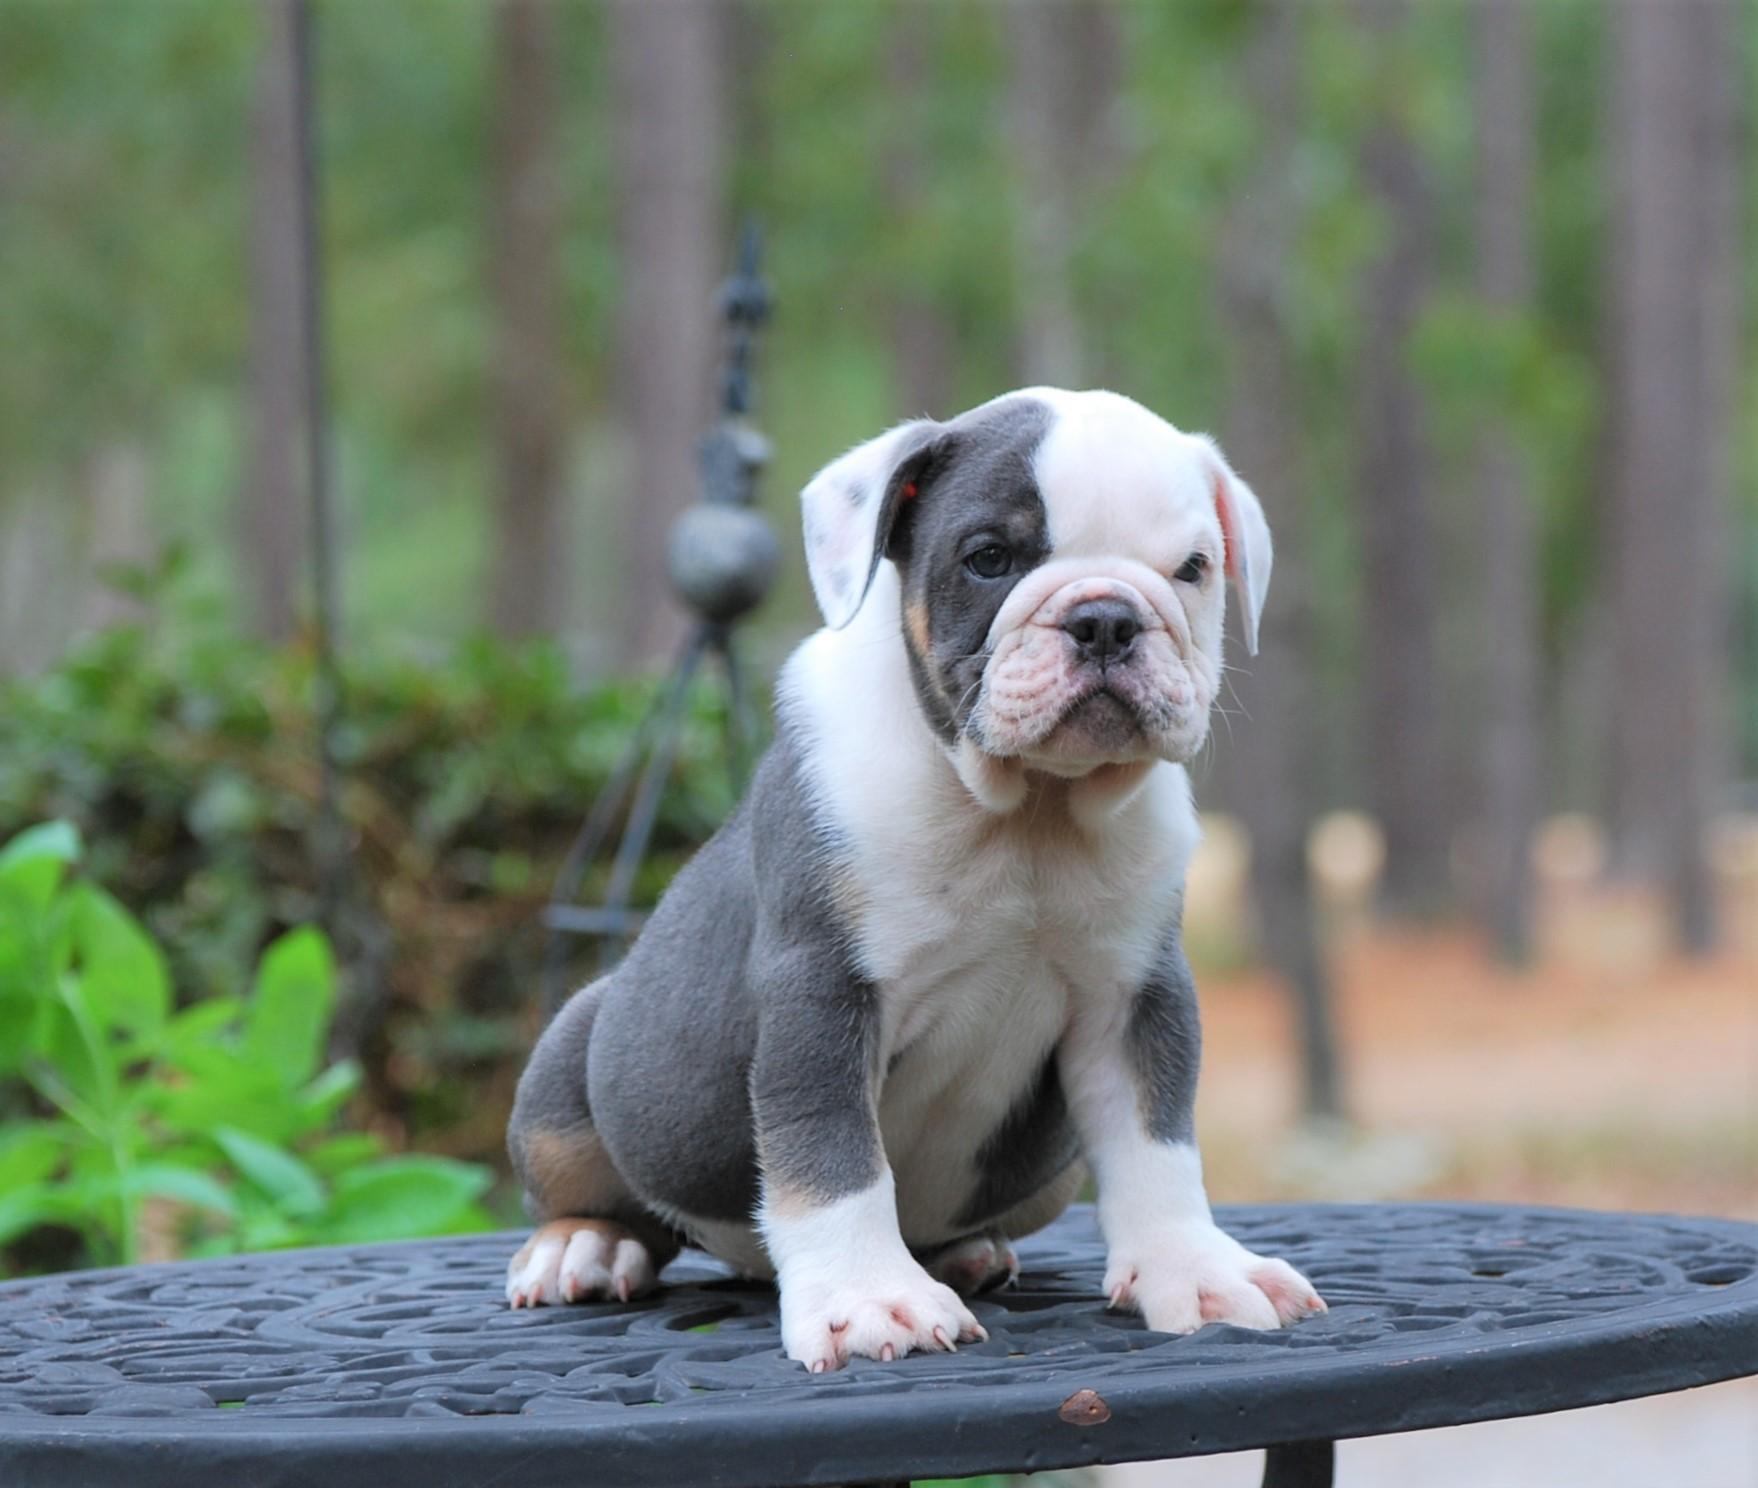 Titan (Sold) Olde English Bulldogge Puppy For Sale | Photo 2